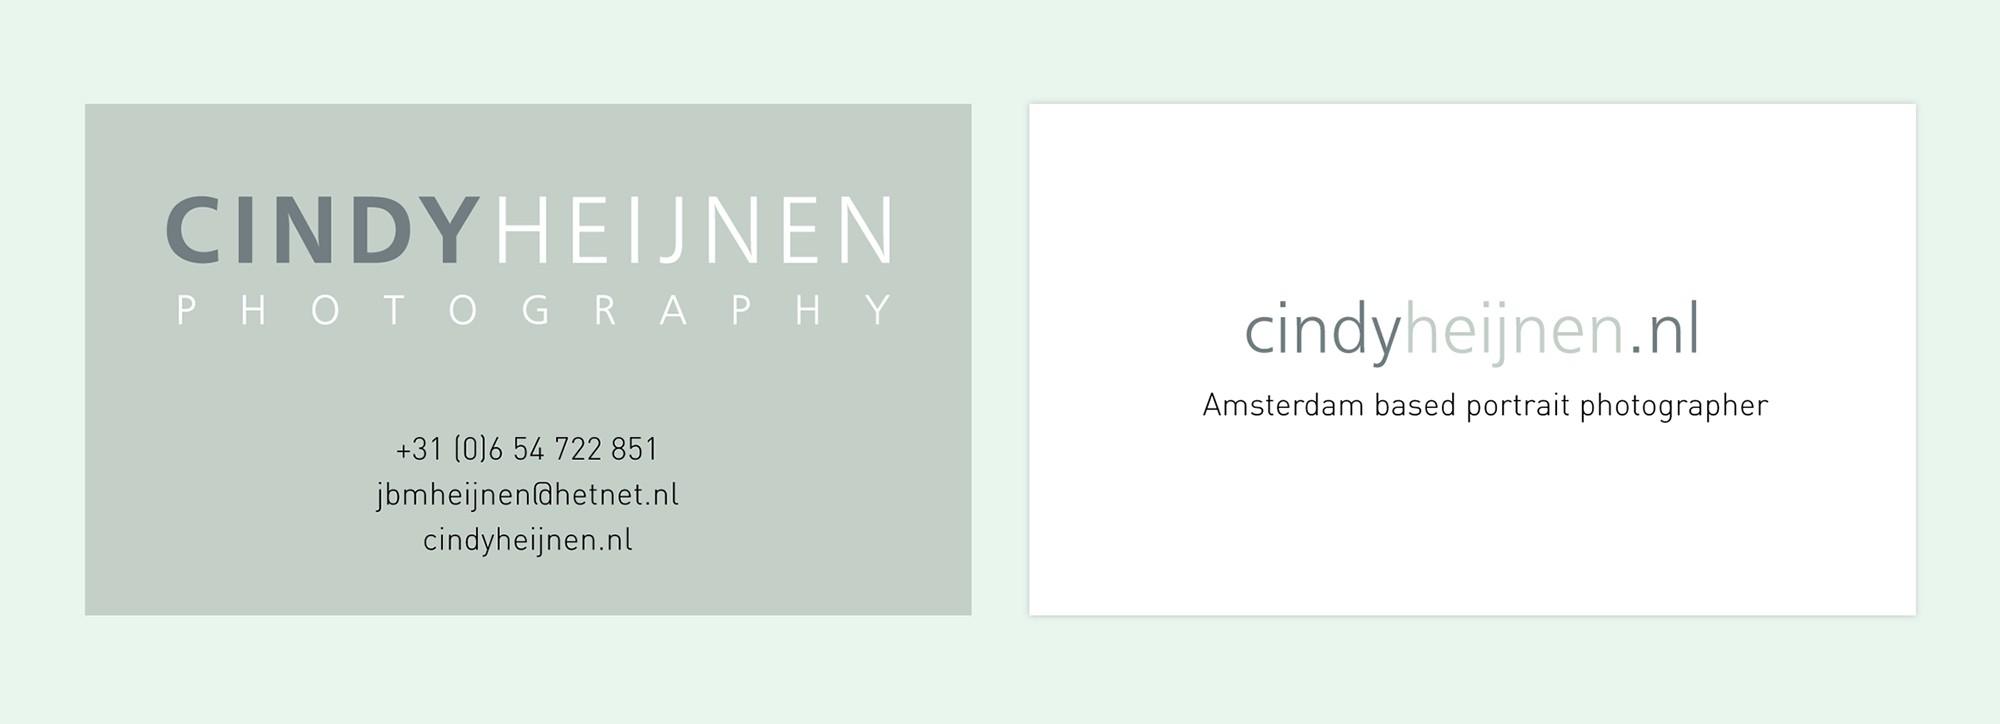 Cindy Heijnen Photography